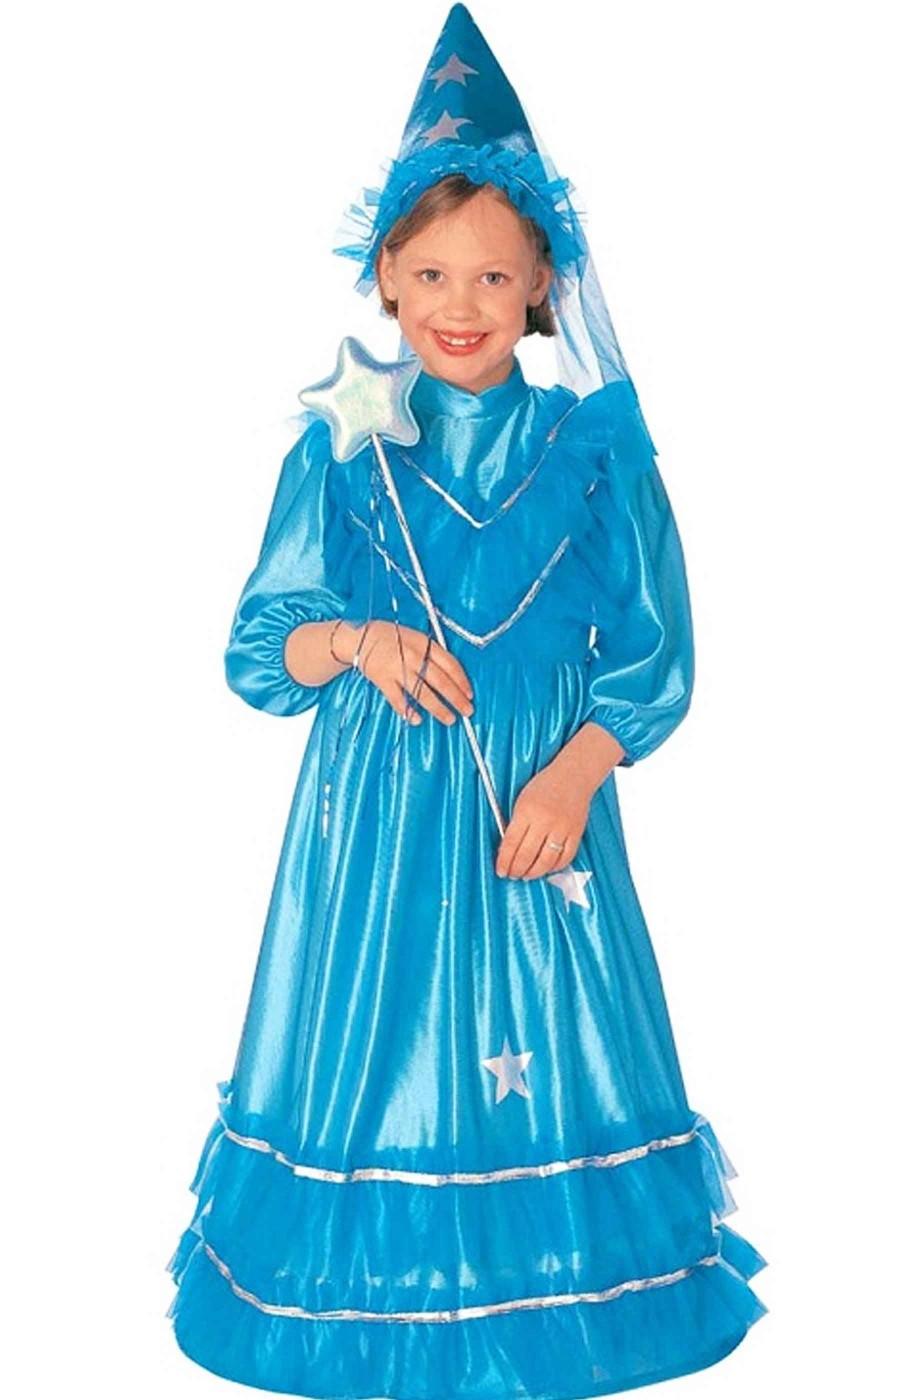 Costume di carnevale Bambina da Fatina Blu fata turchina